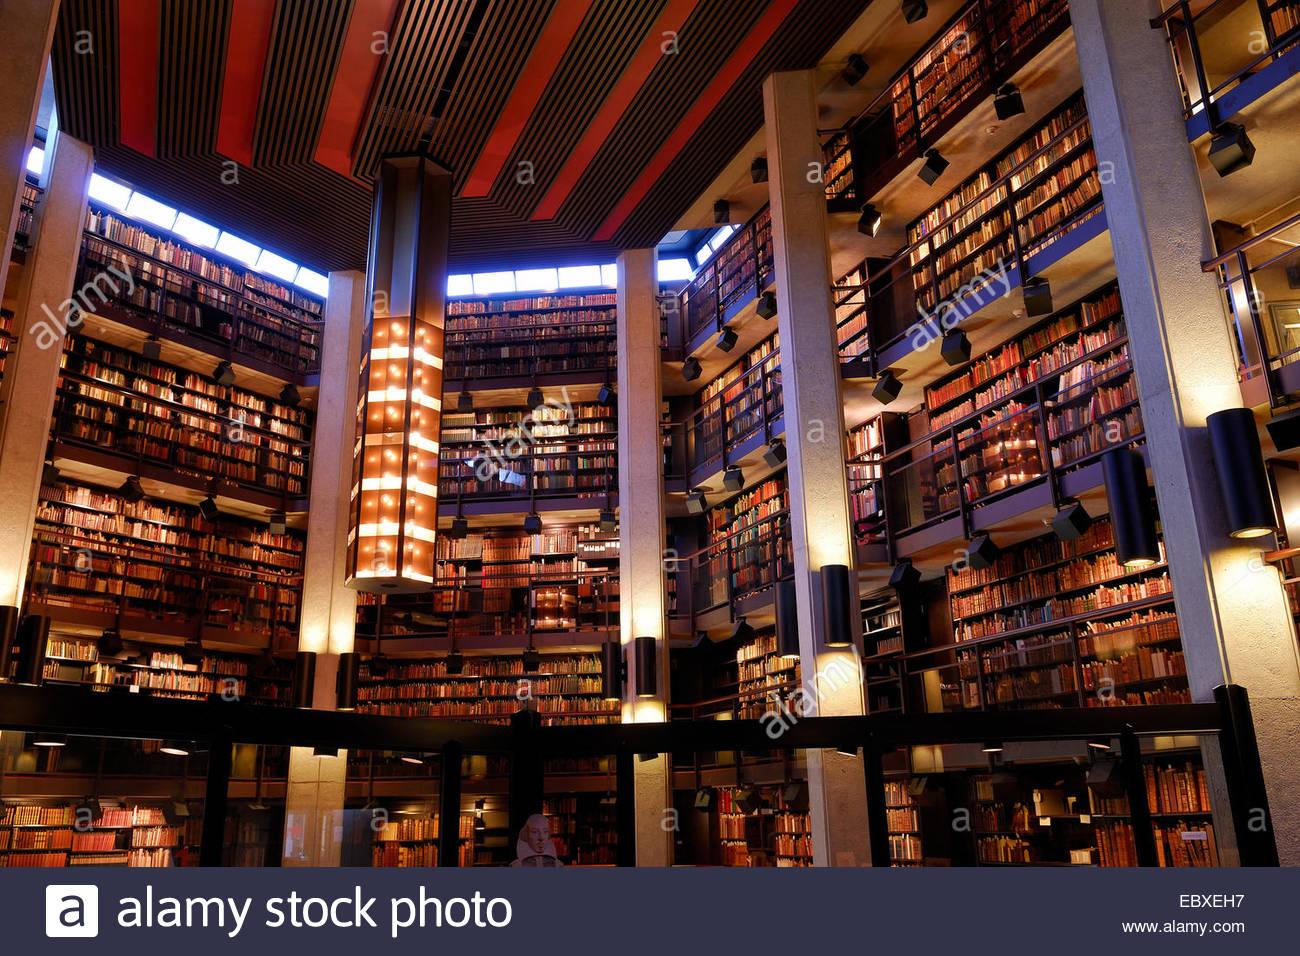 Thomas Fisher Rare Book Library and Shakespeare, Canada, Ontario, Toronto - Stock Image